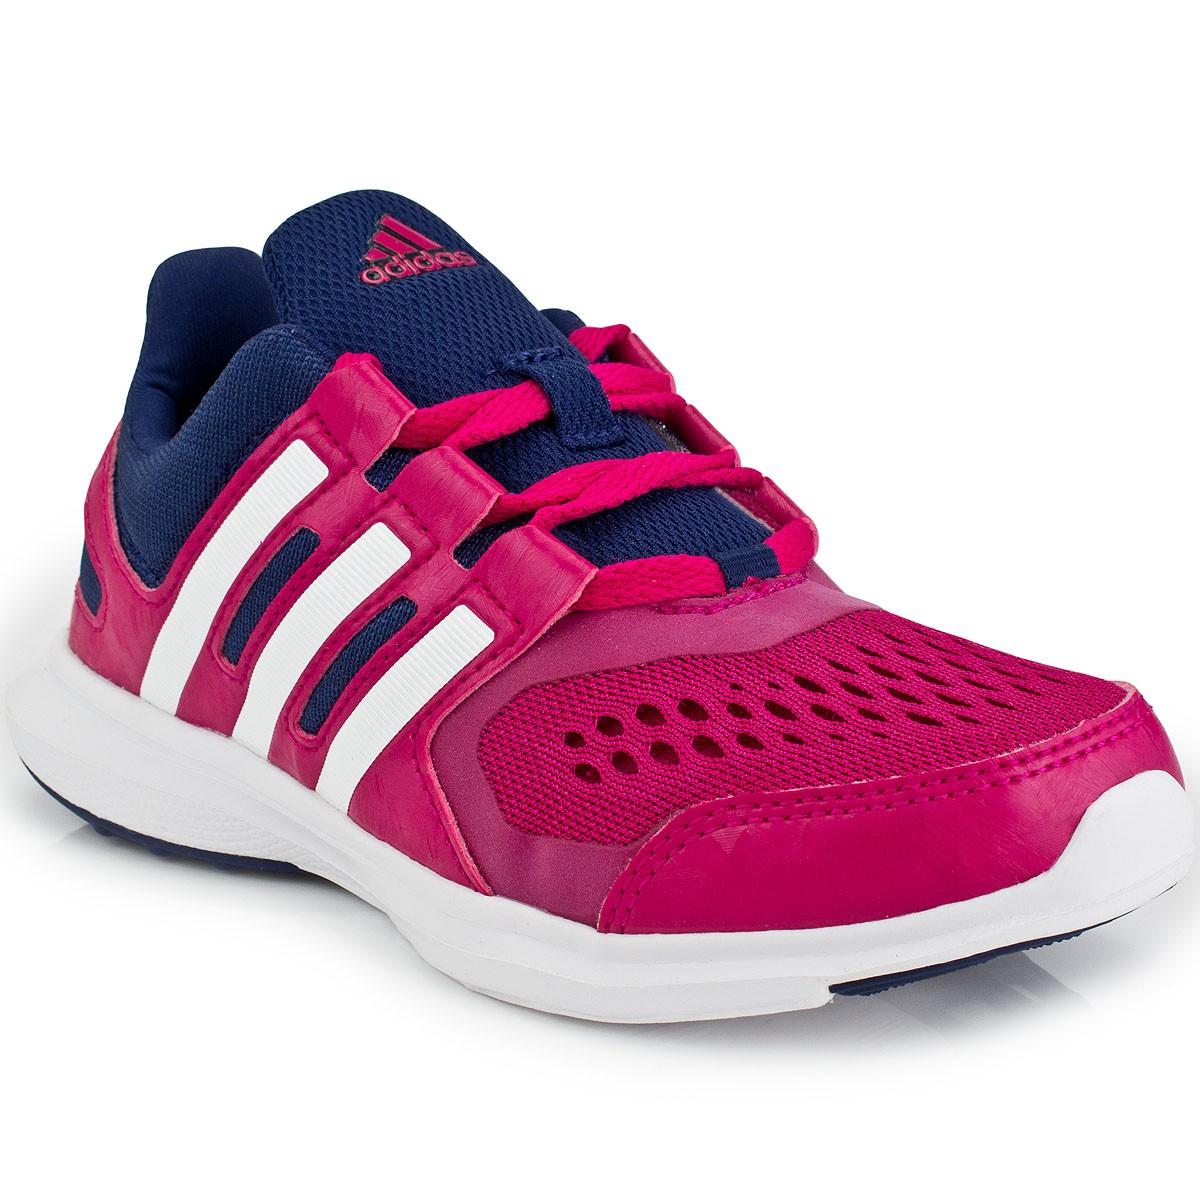 9ca1af05dde Tênis Adidas Hyperfast 2 K S82590